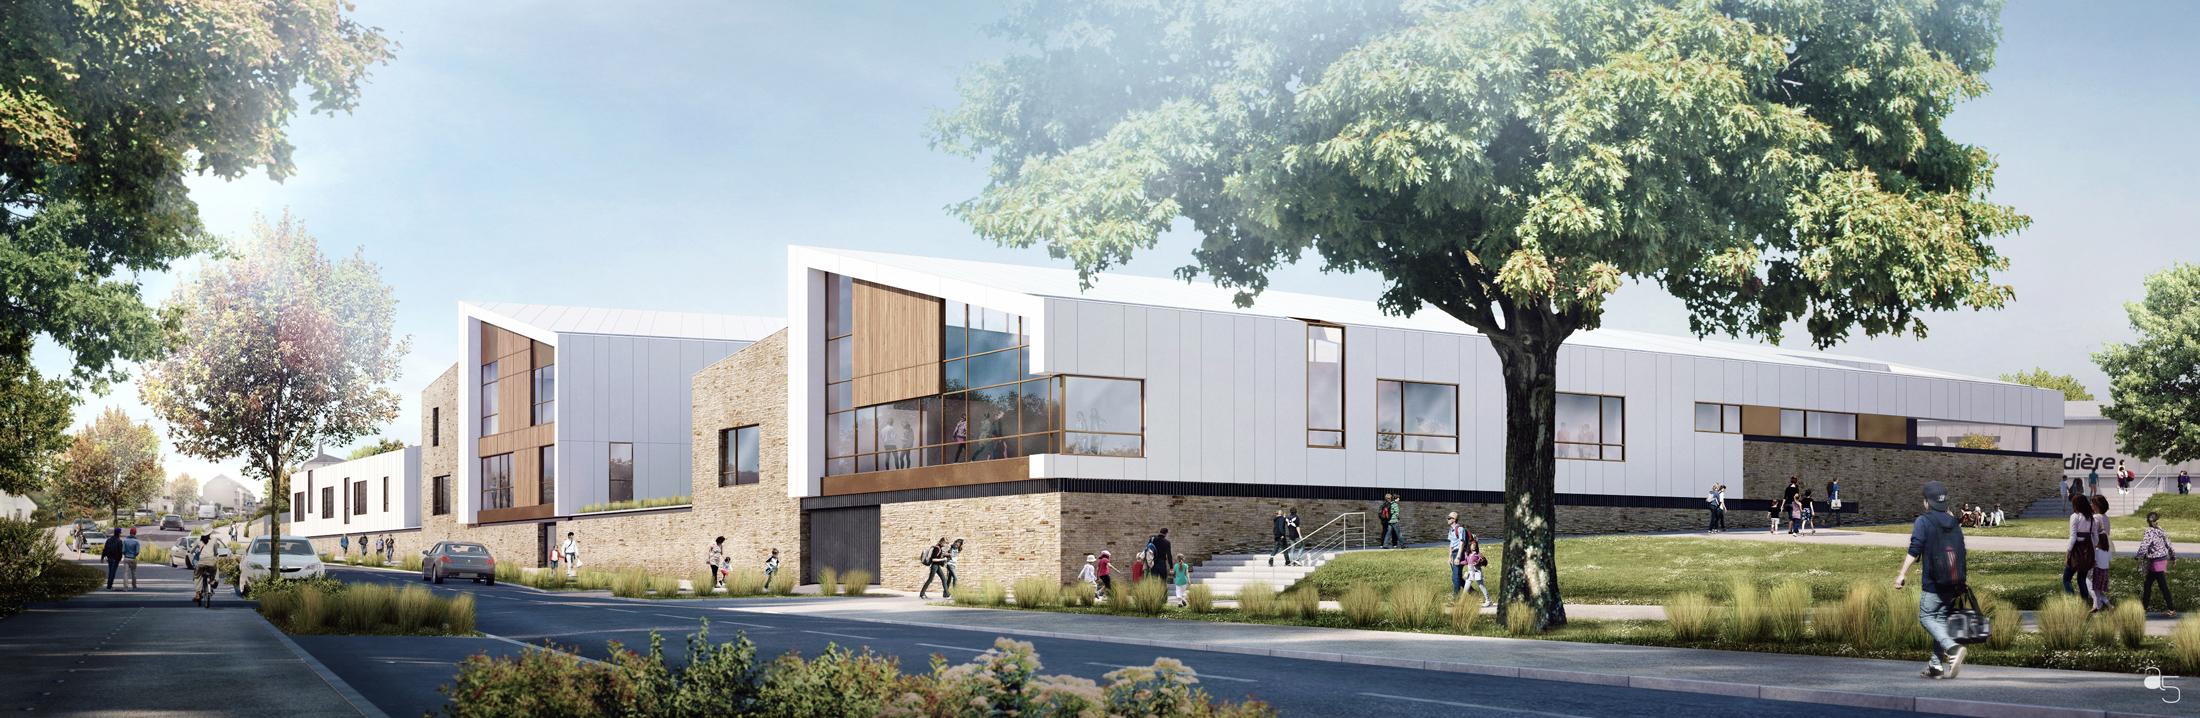 DCL Architectes - Concours groupe scolaire Orvault